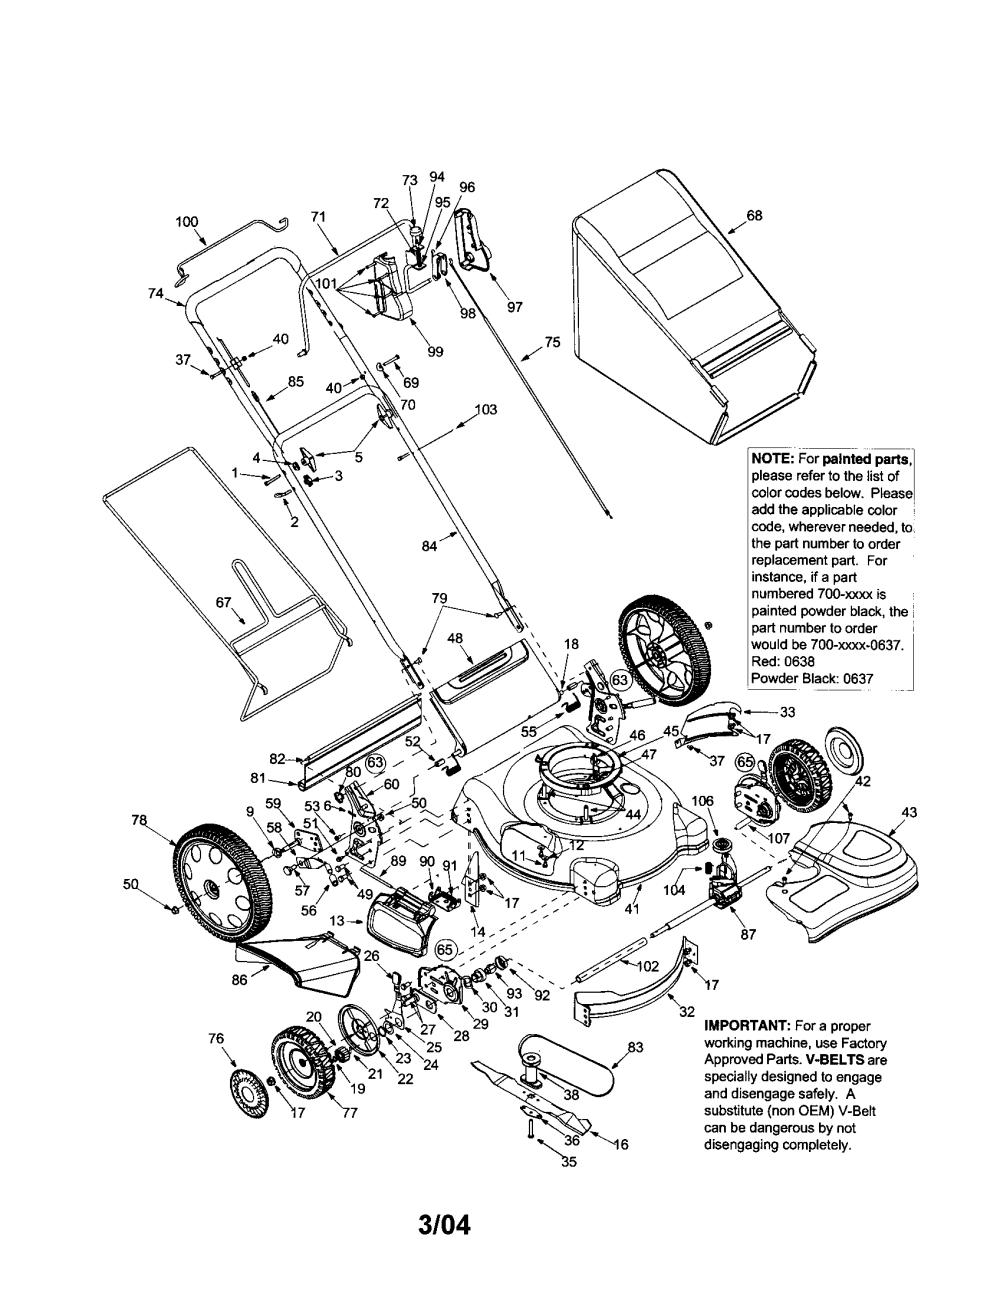 medium resolution of troy bilt mower parts diagrams wiring diagrams my hayter lawn mower parts diagram lawn mower parts diagram